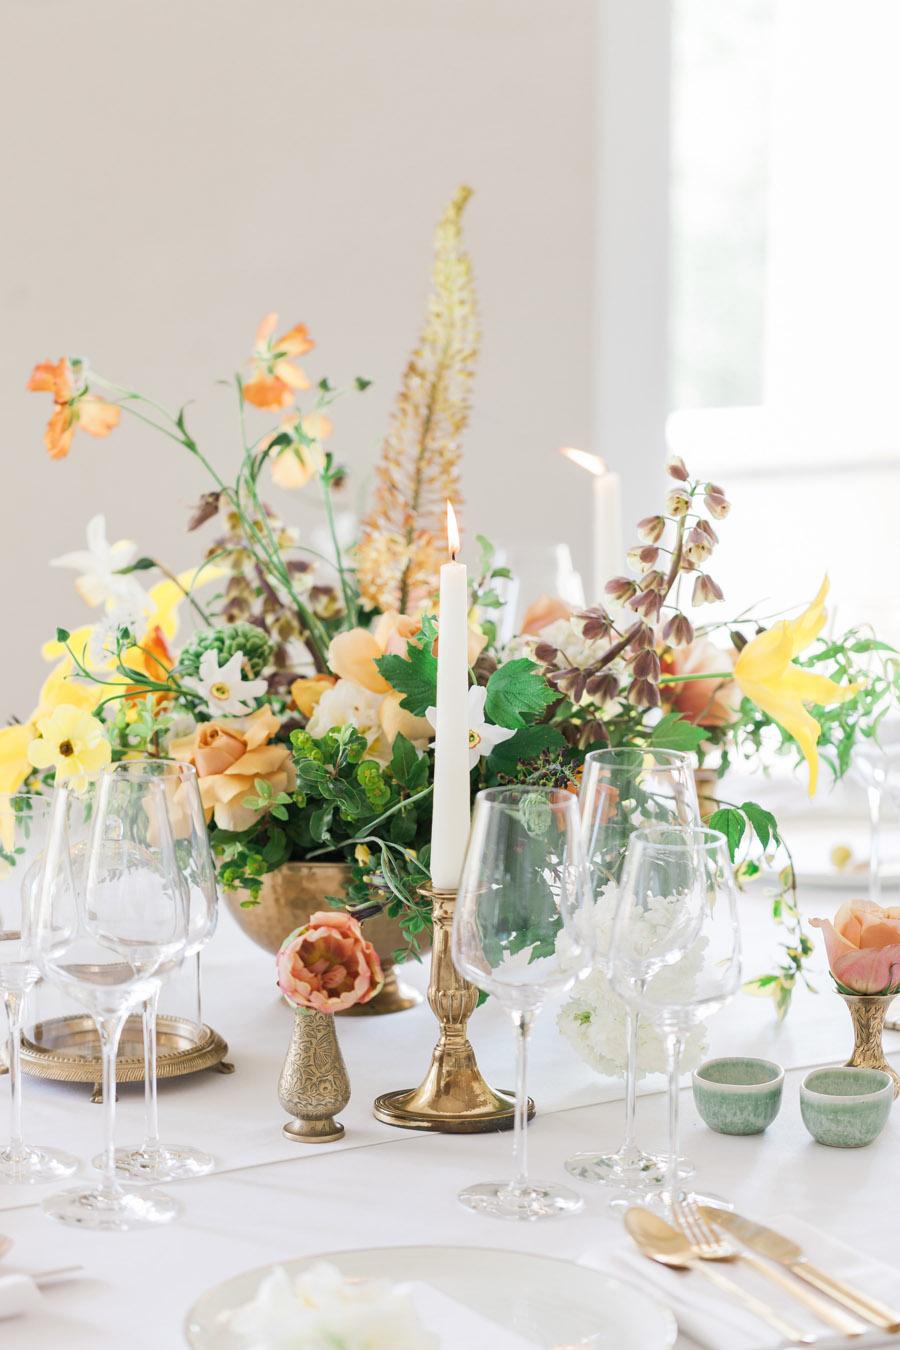 Glorious yellow Bloomologie blooms and styling by Chenai - photo credit Amanda Karen Photography (14)